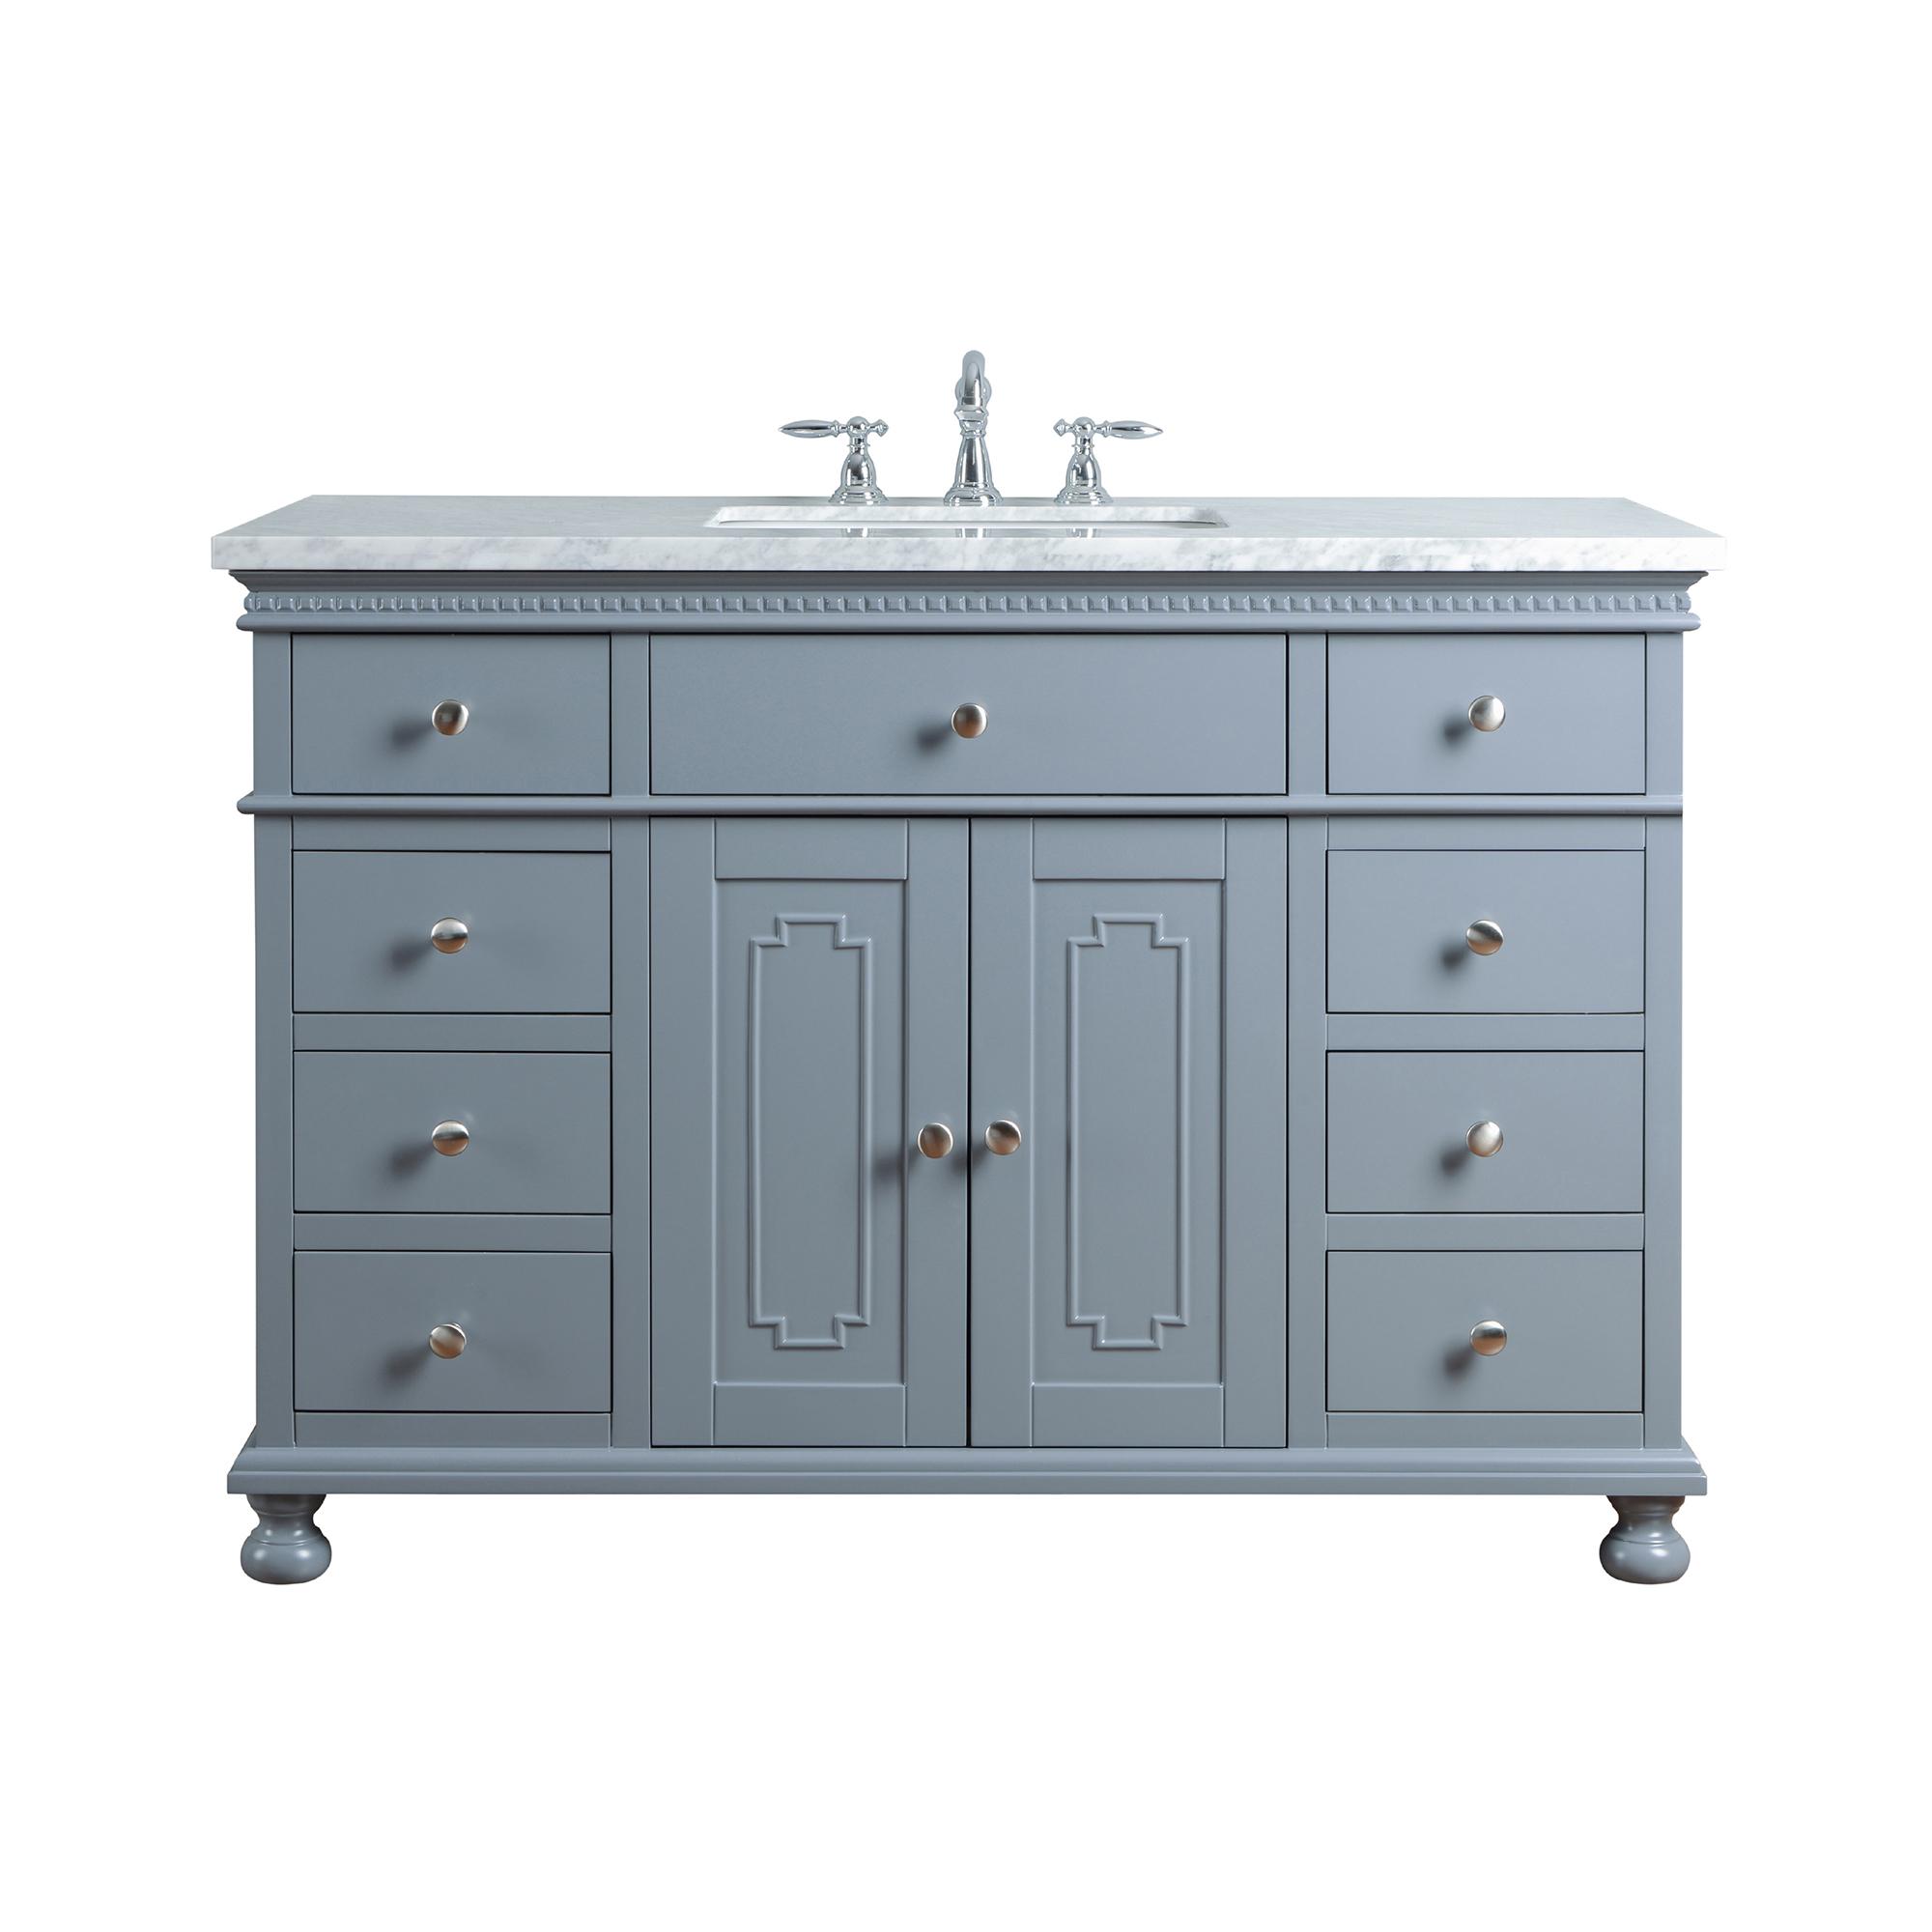 Abigail Embellished 48-inch Single Sink Bathroom Vanity - Grey